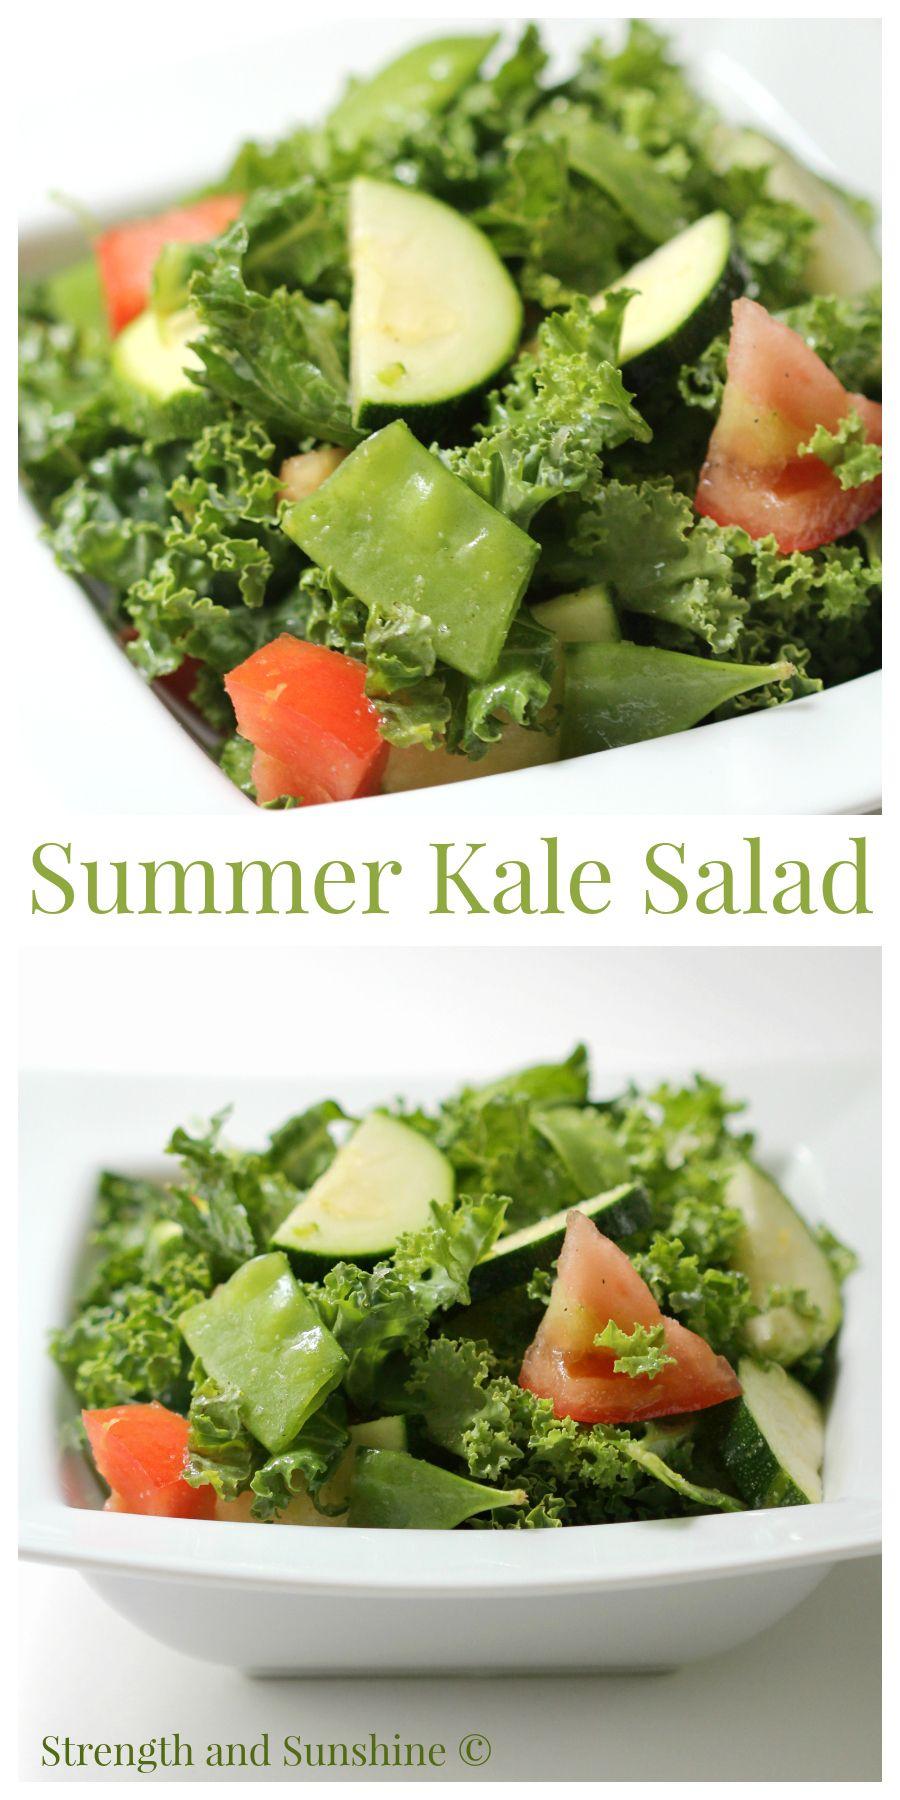 Kale allergy